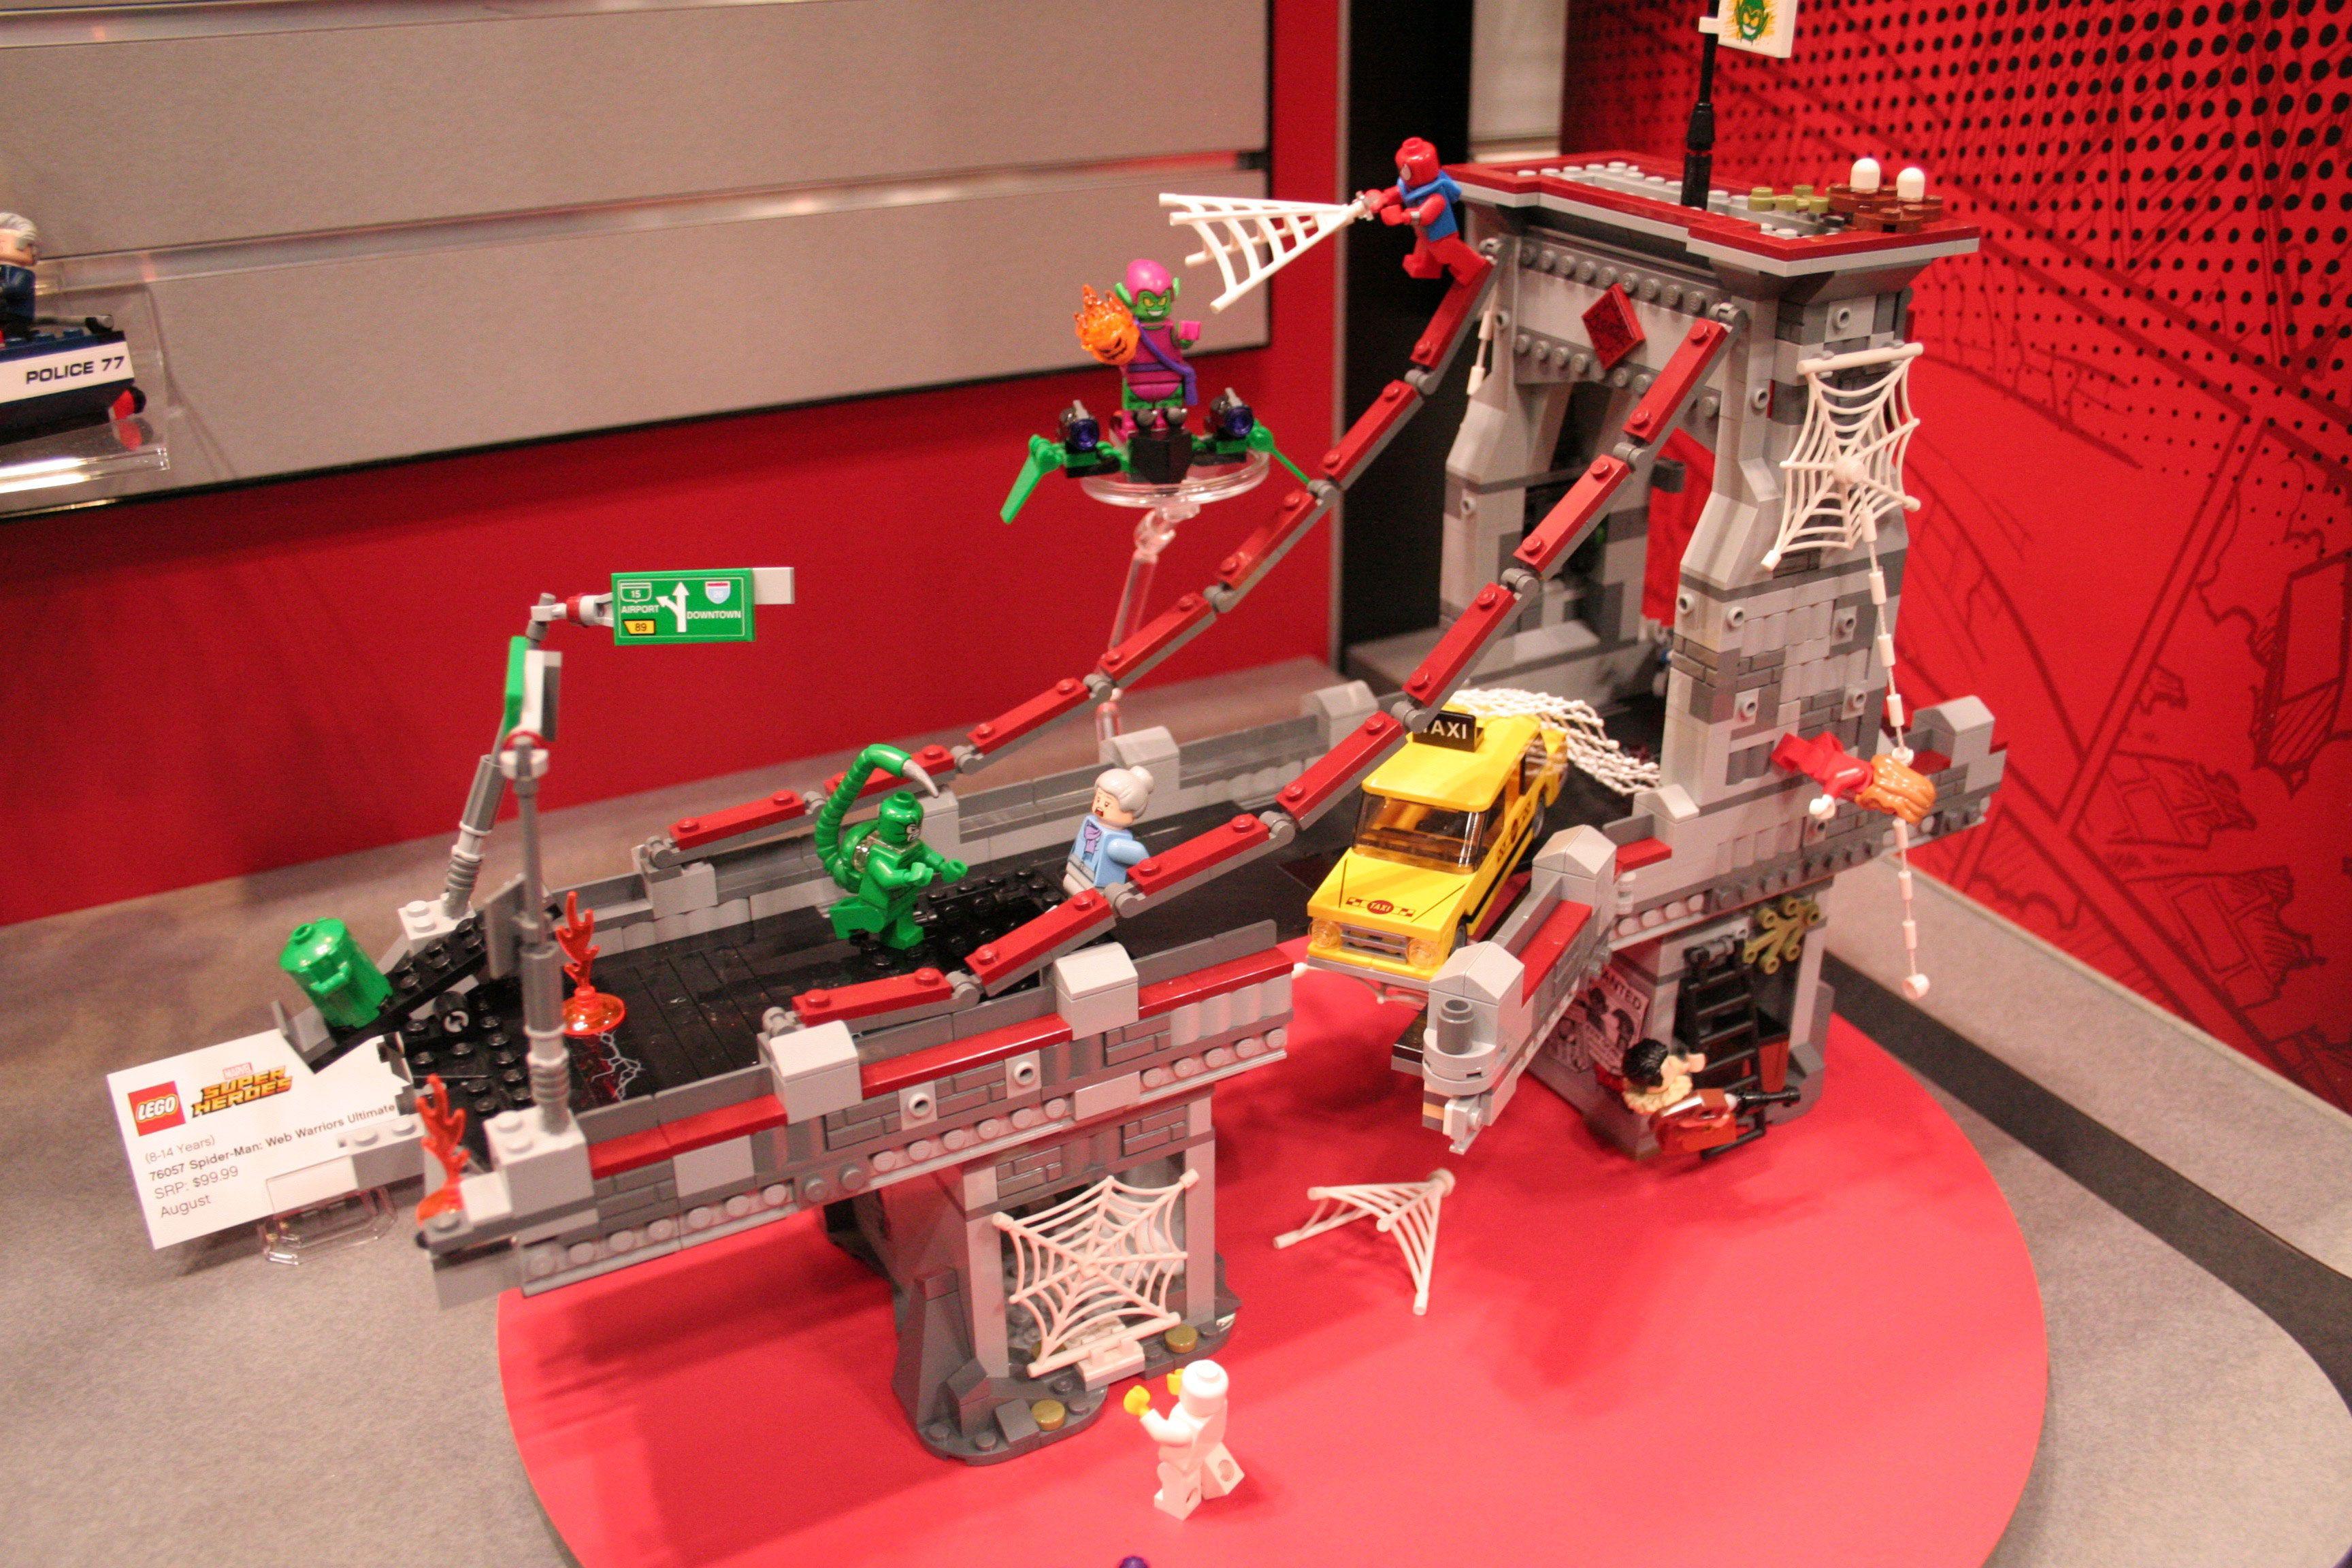 Lego Marvel Toys : Batman vs superman captain america lego images from toy